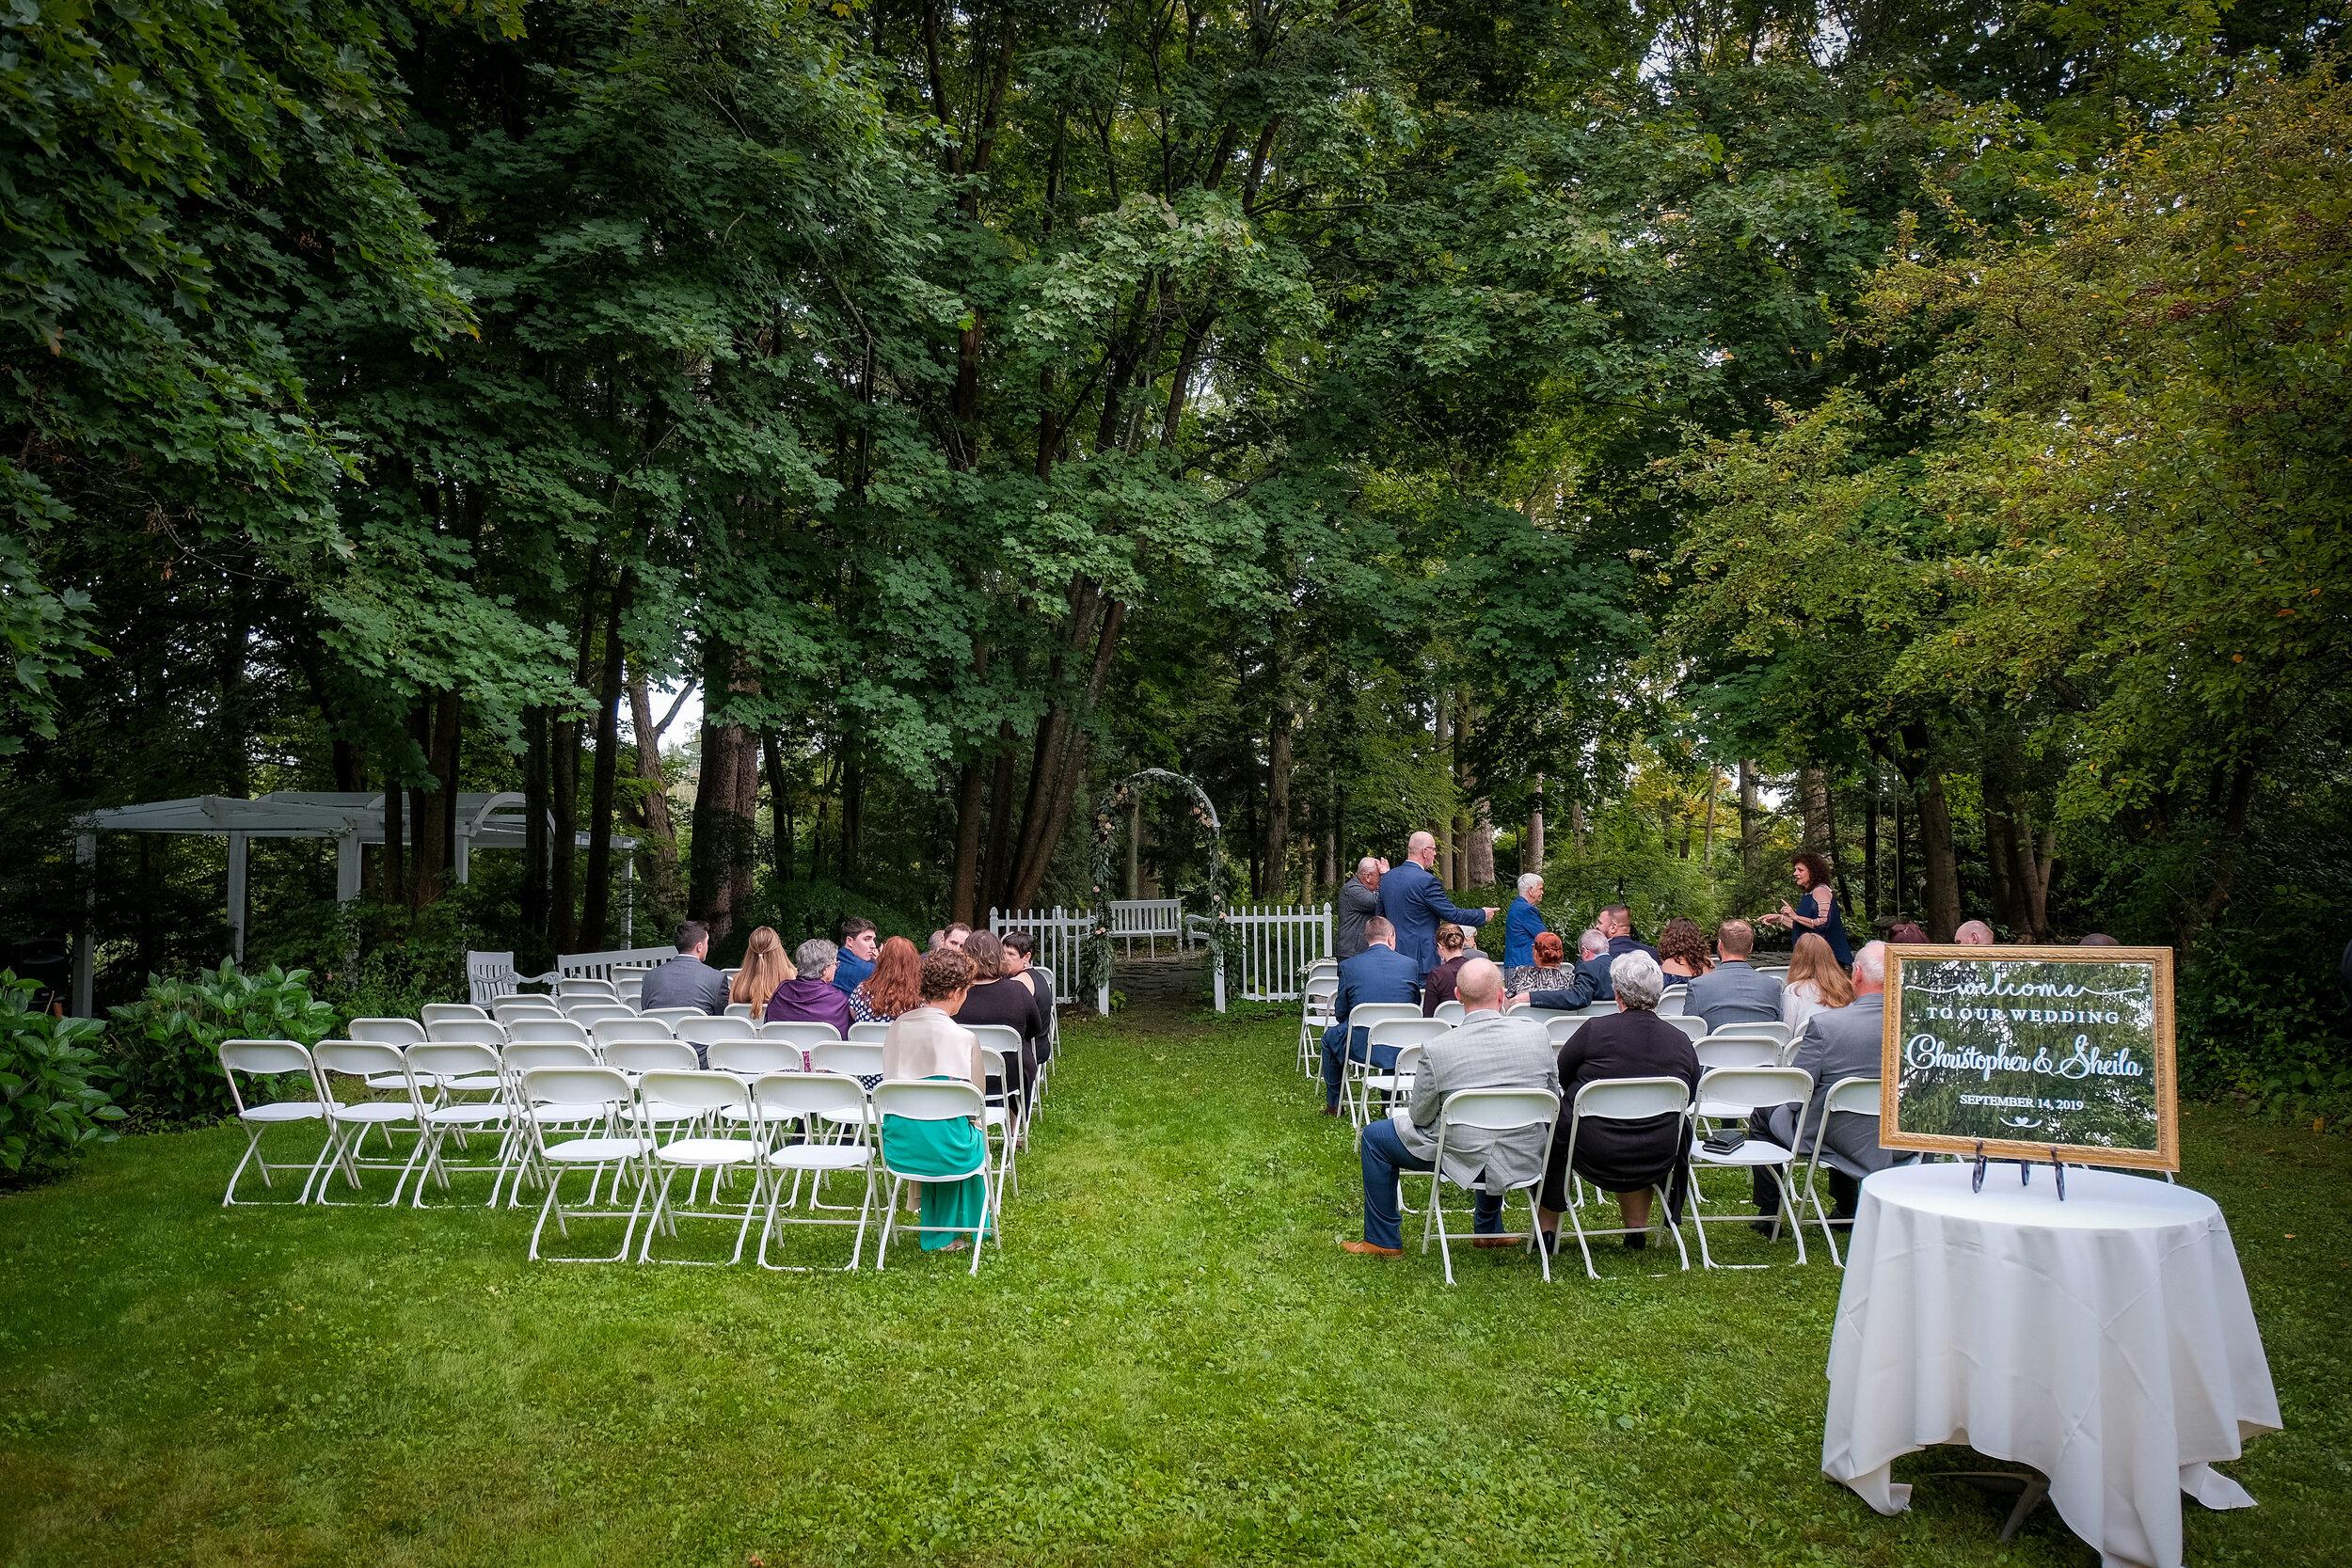 three-chimneys-inn-wedding-photography-415.jpg